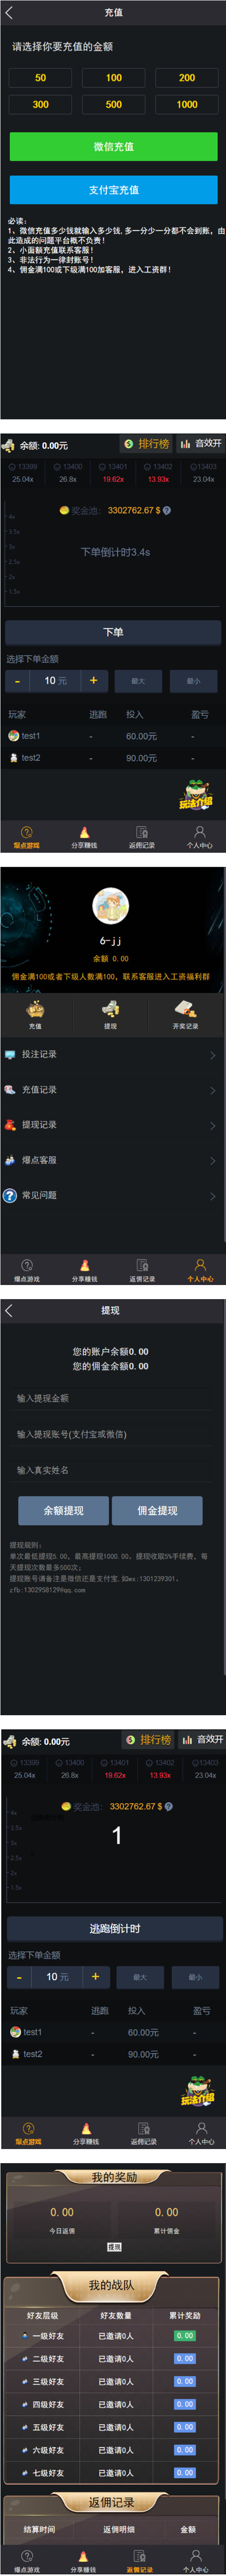 【H5爆点】11月最新 YL火箭逃跑刺激财富翻倍无授权 已对接特派支付+免公众号接口 第2张